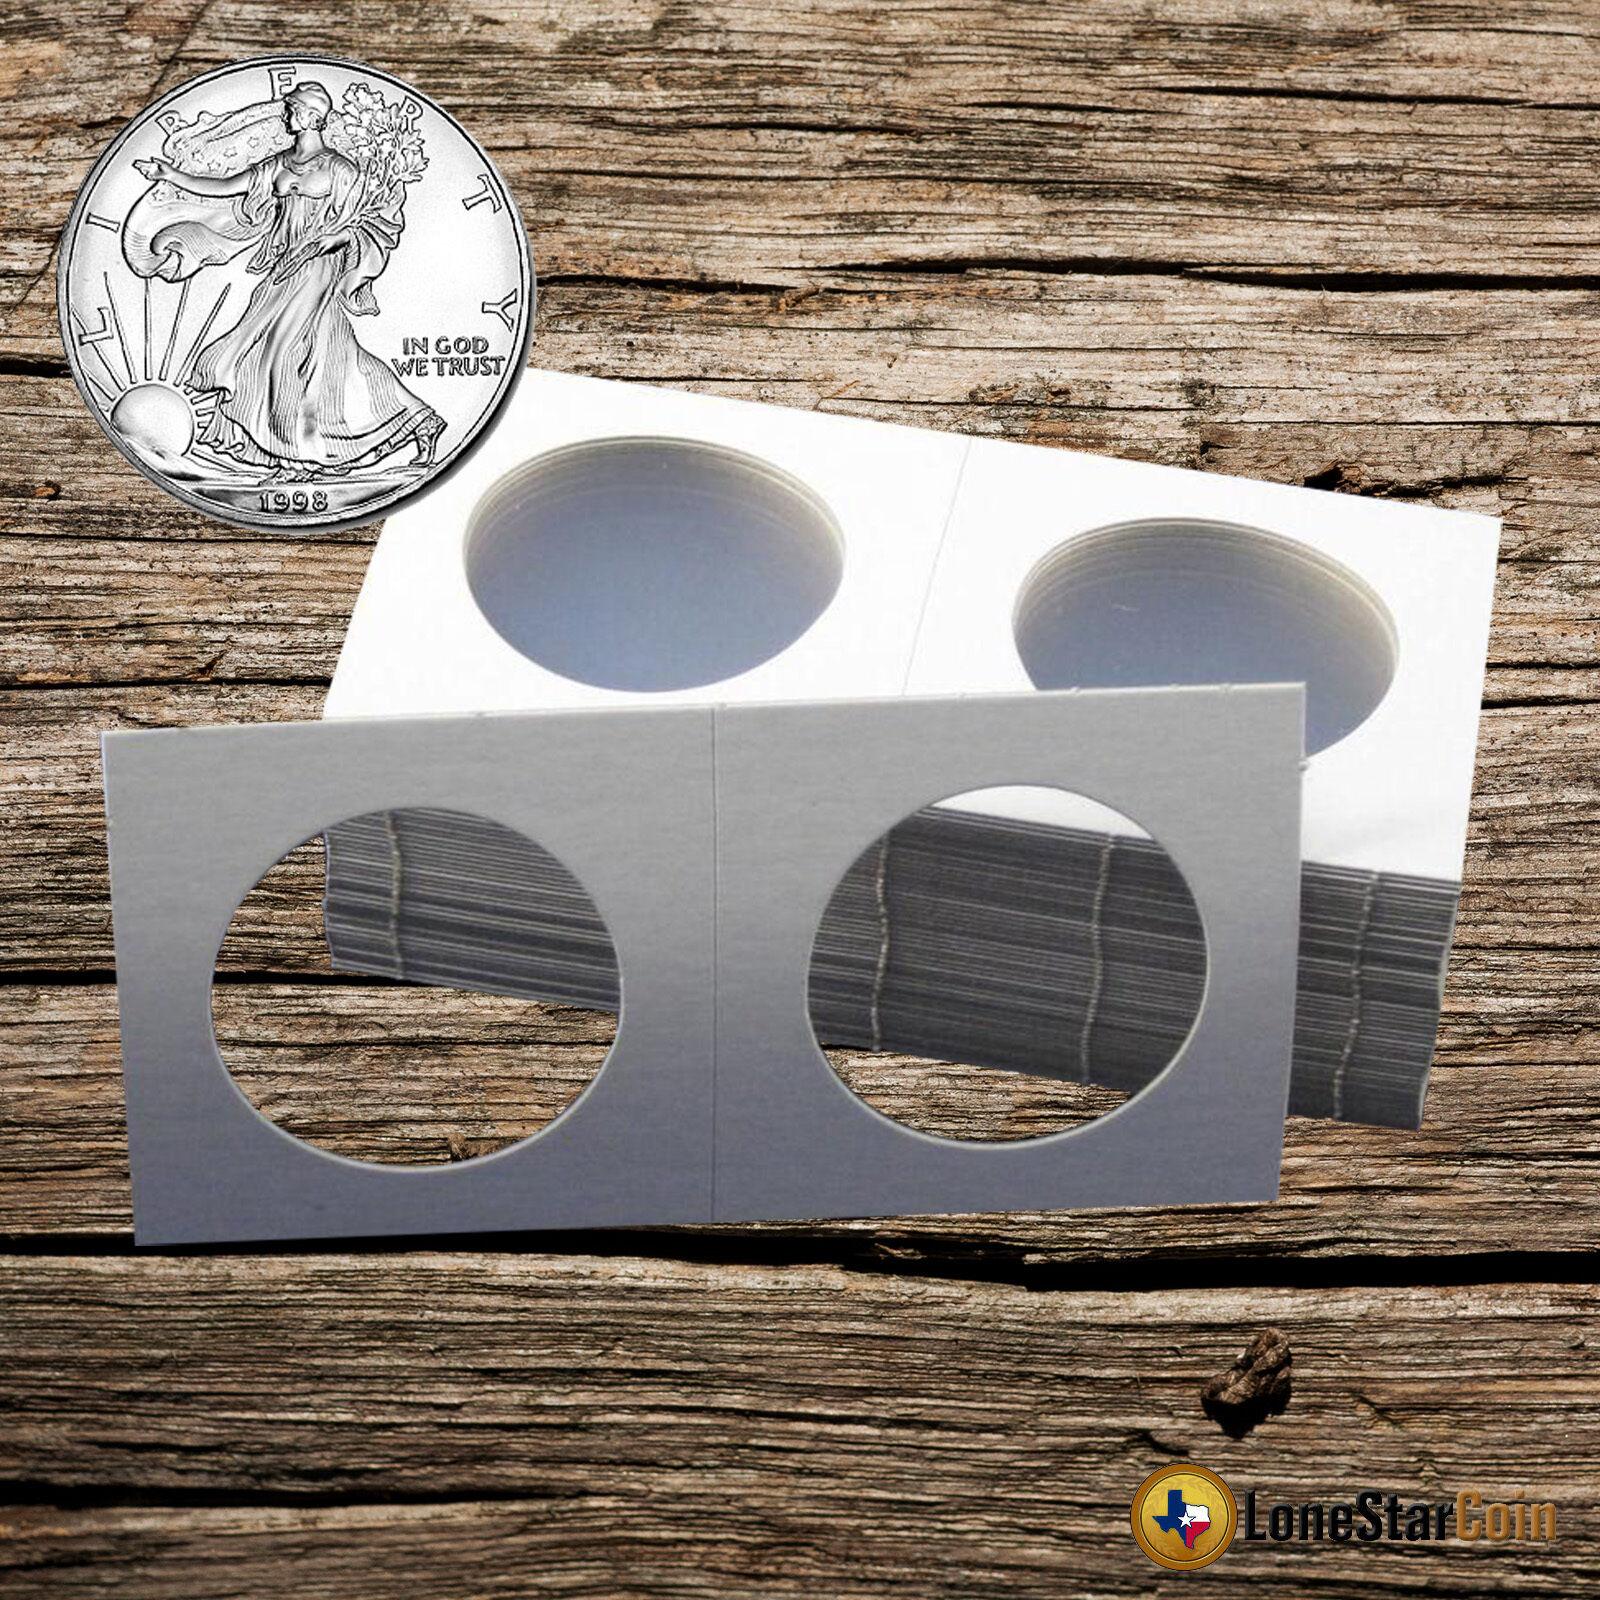 25 BCW Silver Eagle Coin Holder 2.5x2.5 Crown Mylar Cardboard Flip Storage Case